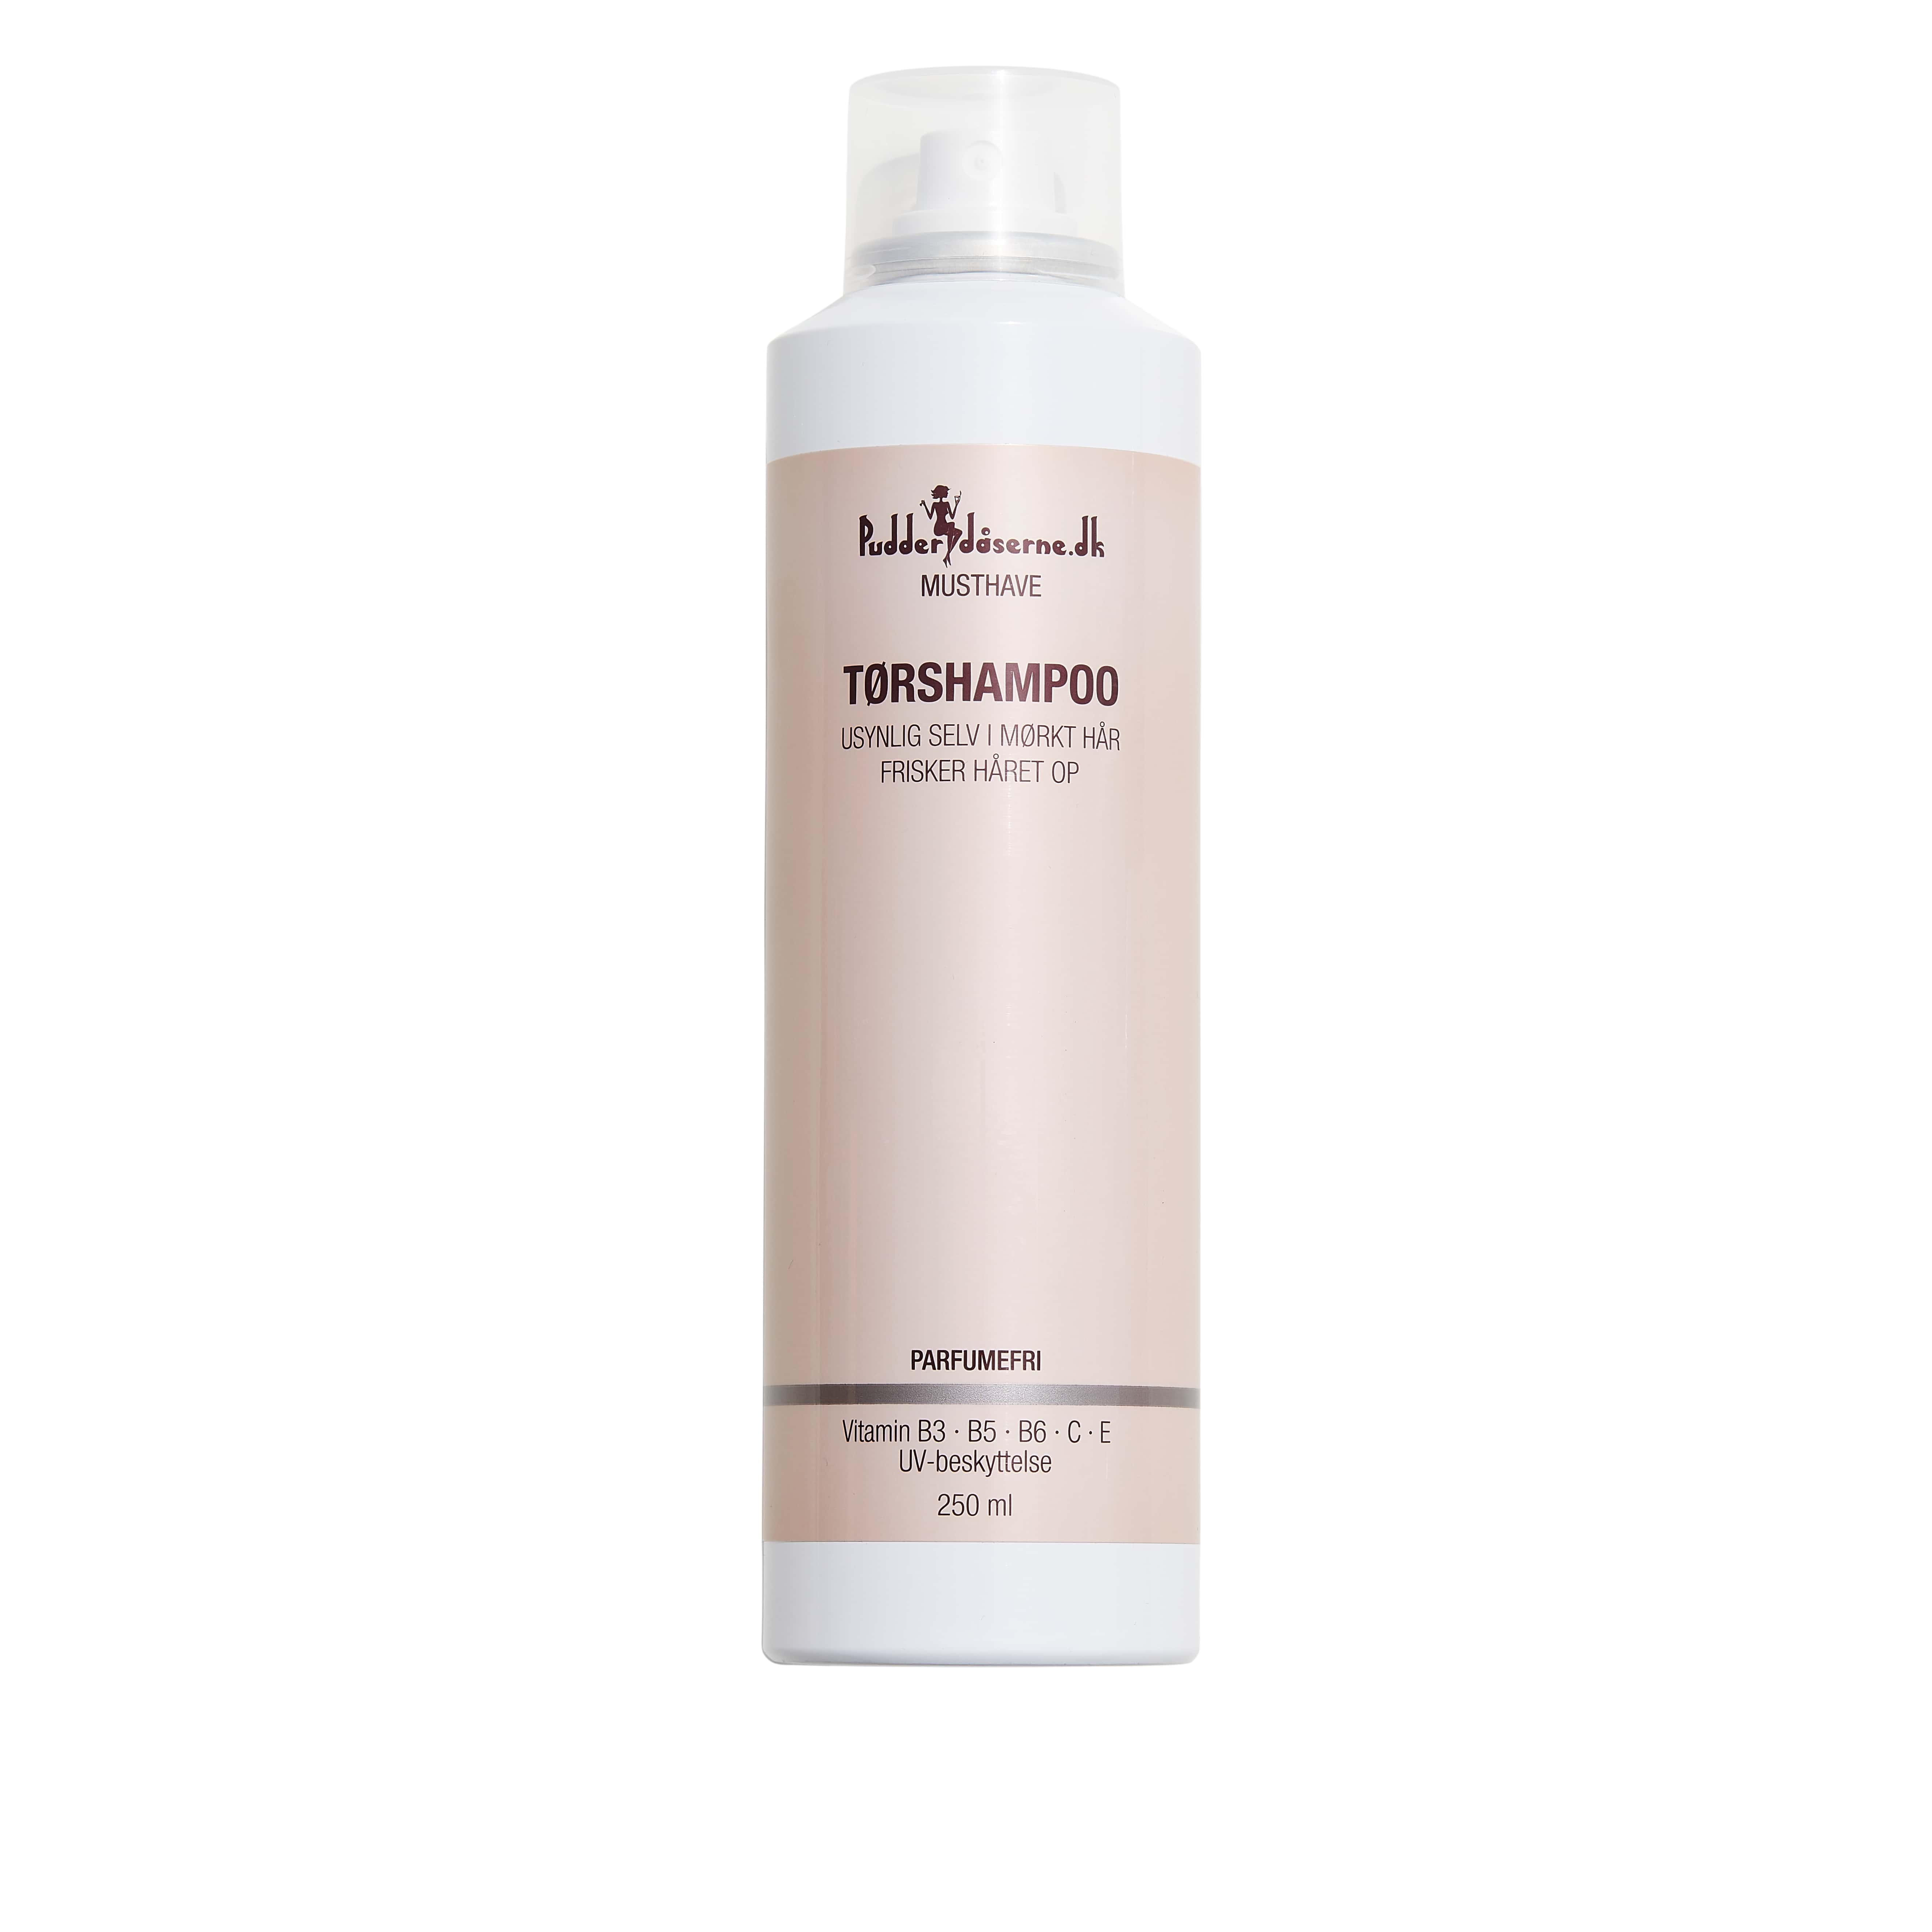 Pudderdåserne Tørshampoo, 250 ml